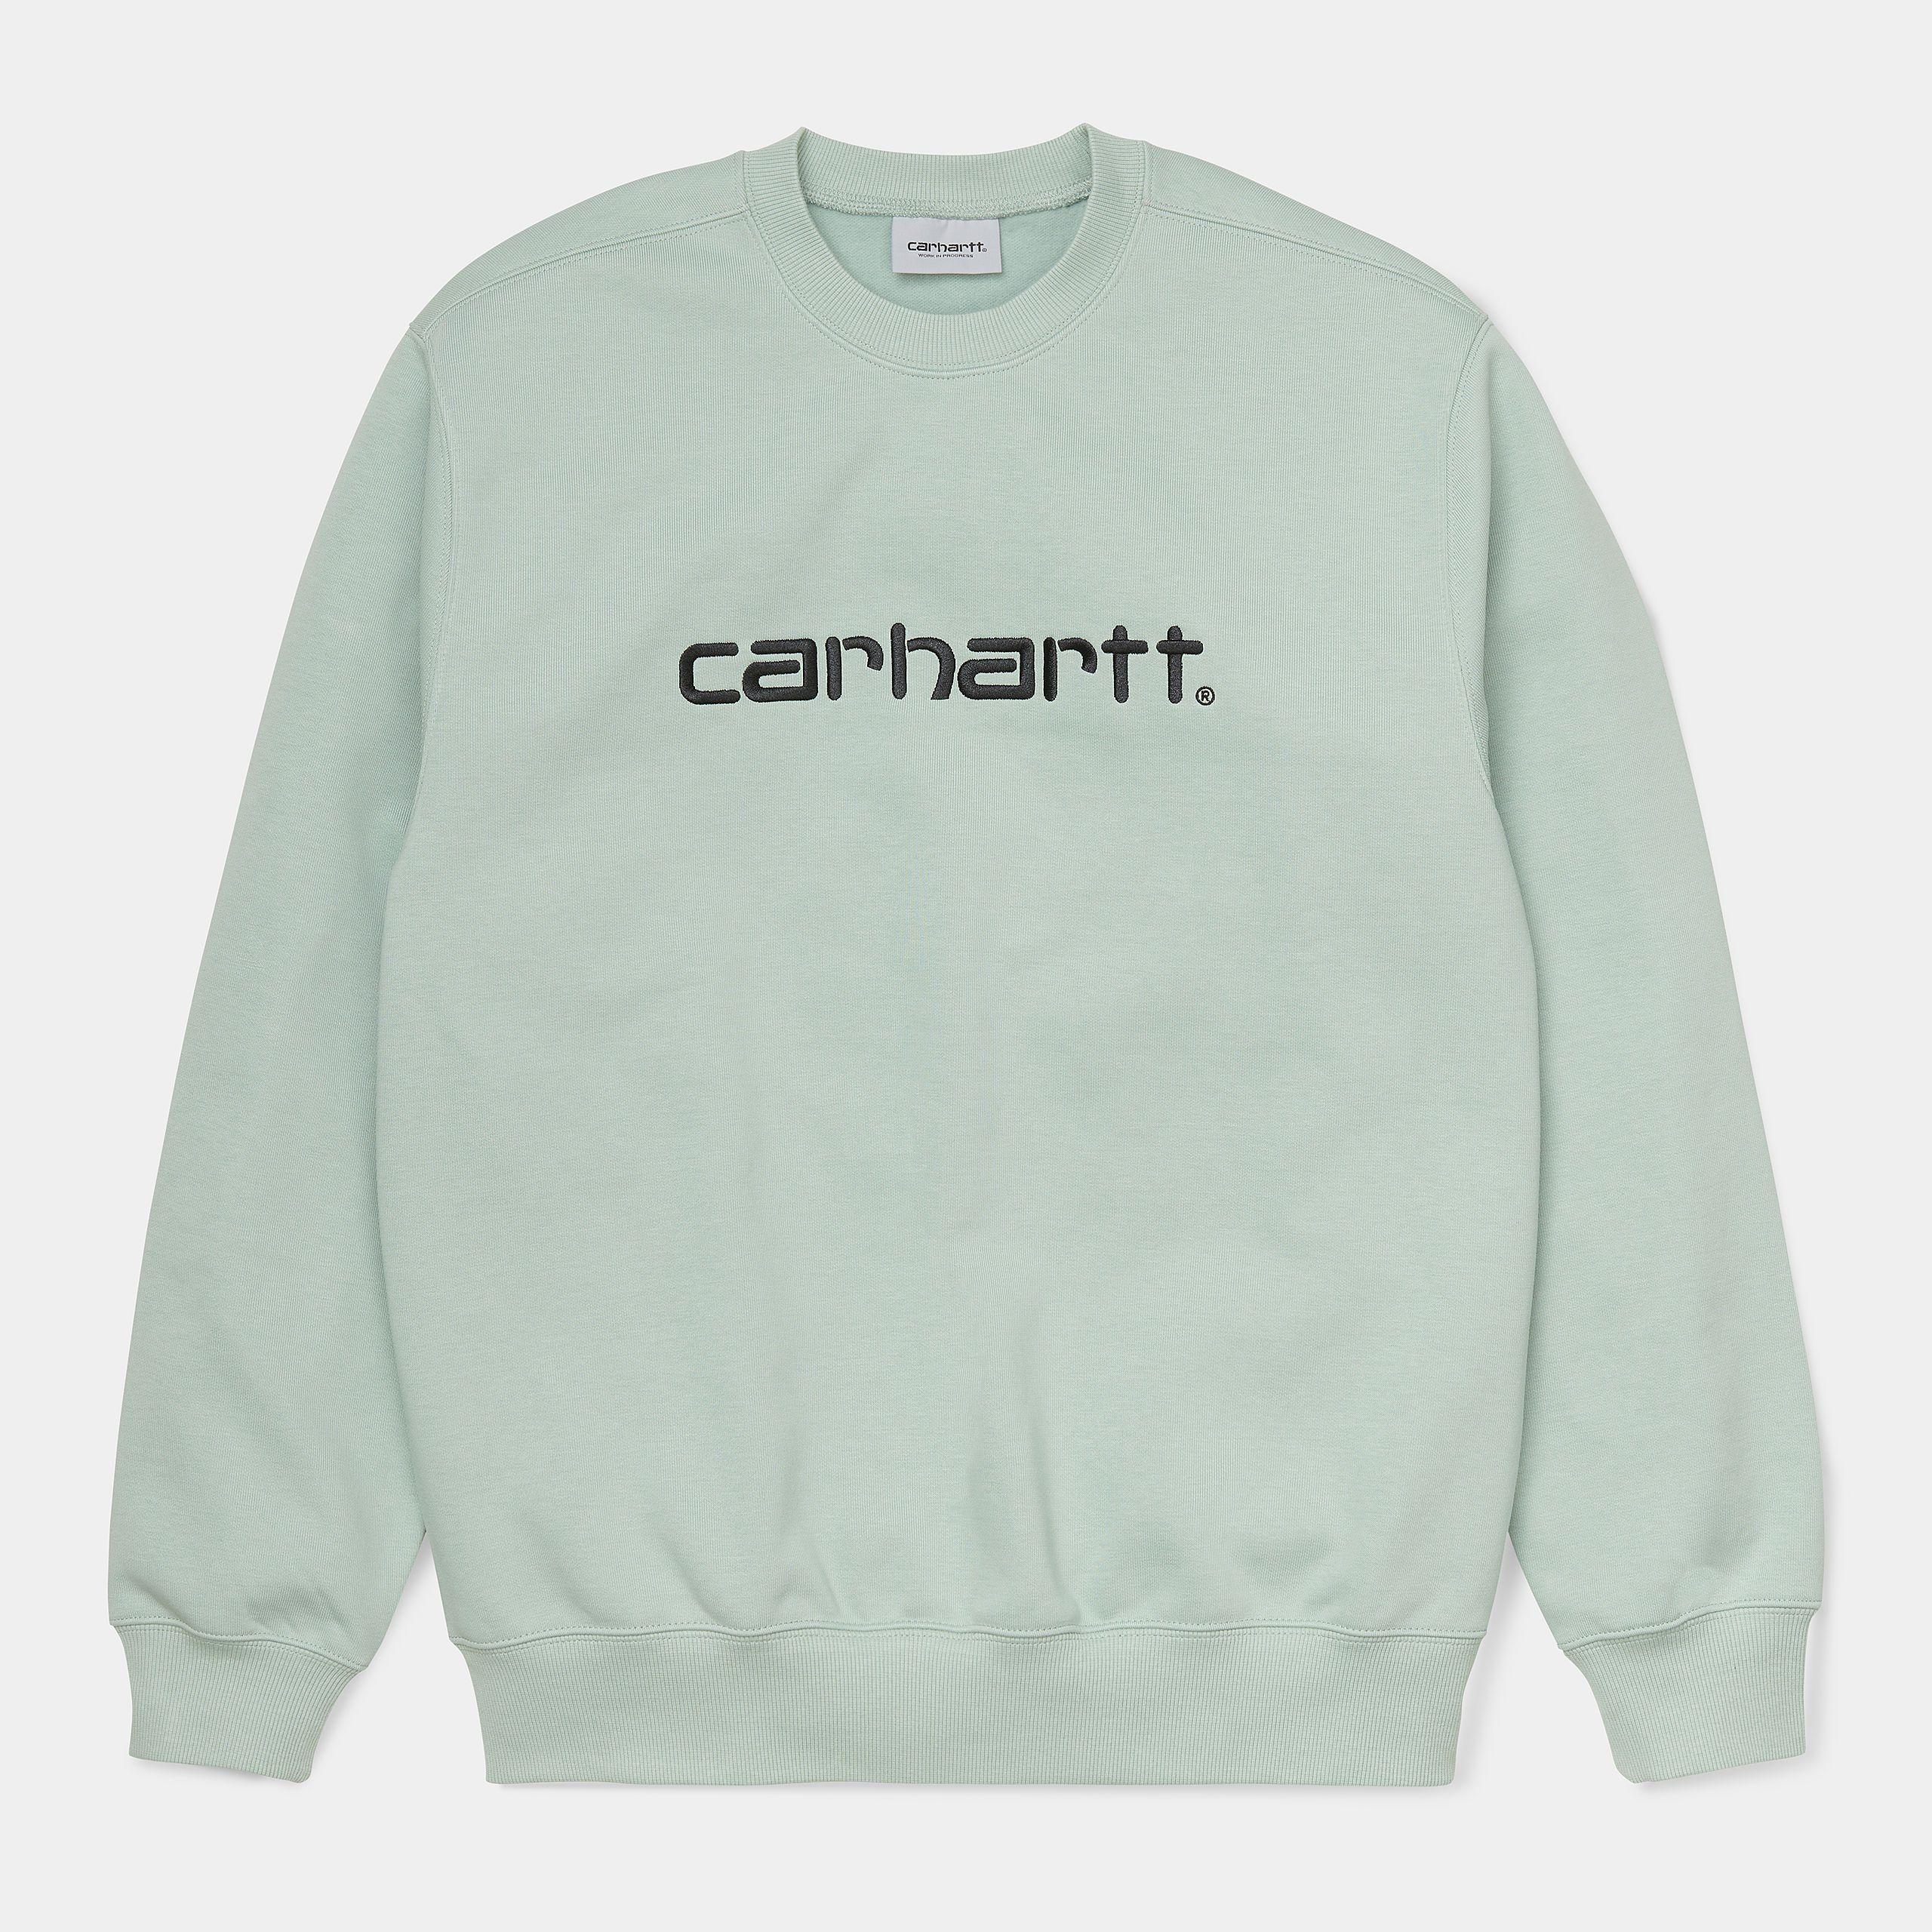 Carhartt Wip Carhartt Sweatshirt Carhartt Wip Com Carhartt Sweatshirts Sweatshirts Carhartt [ 2560 x 2560 Pixel ]